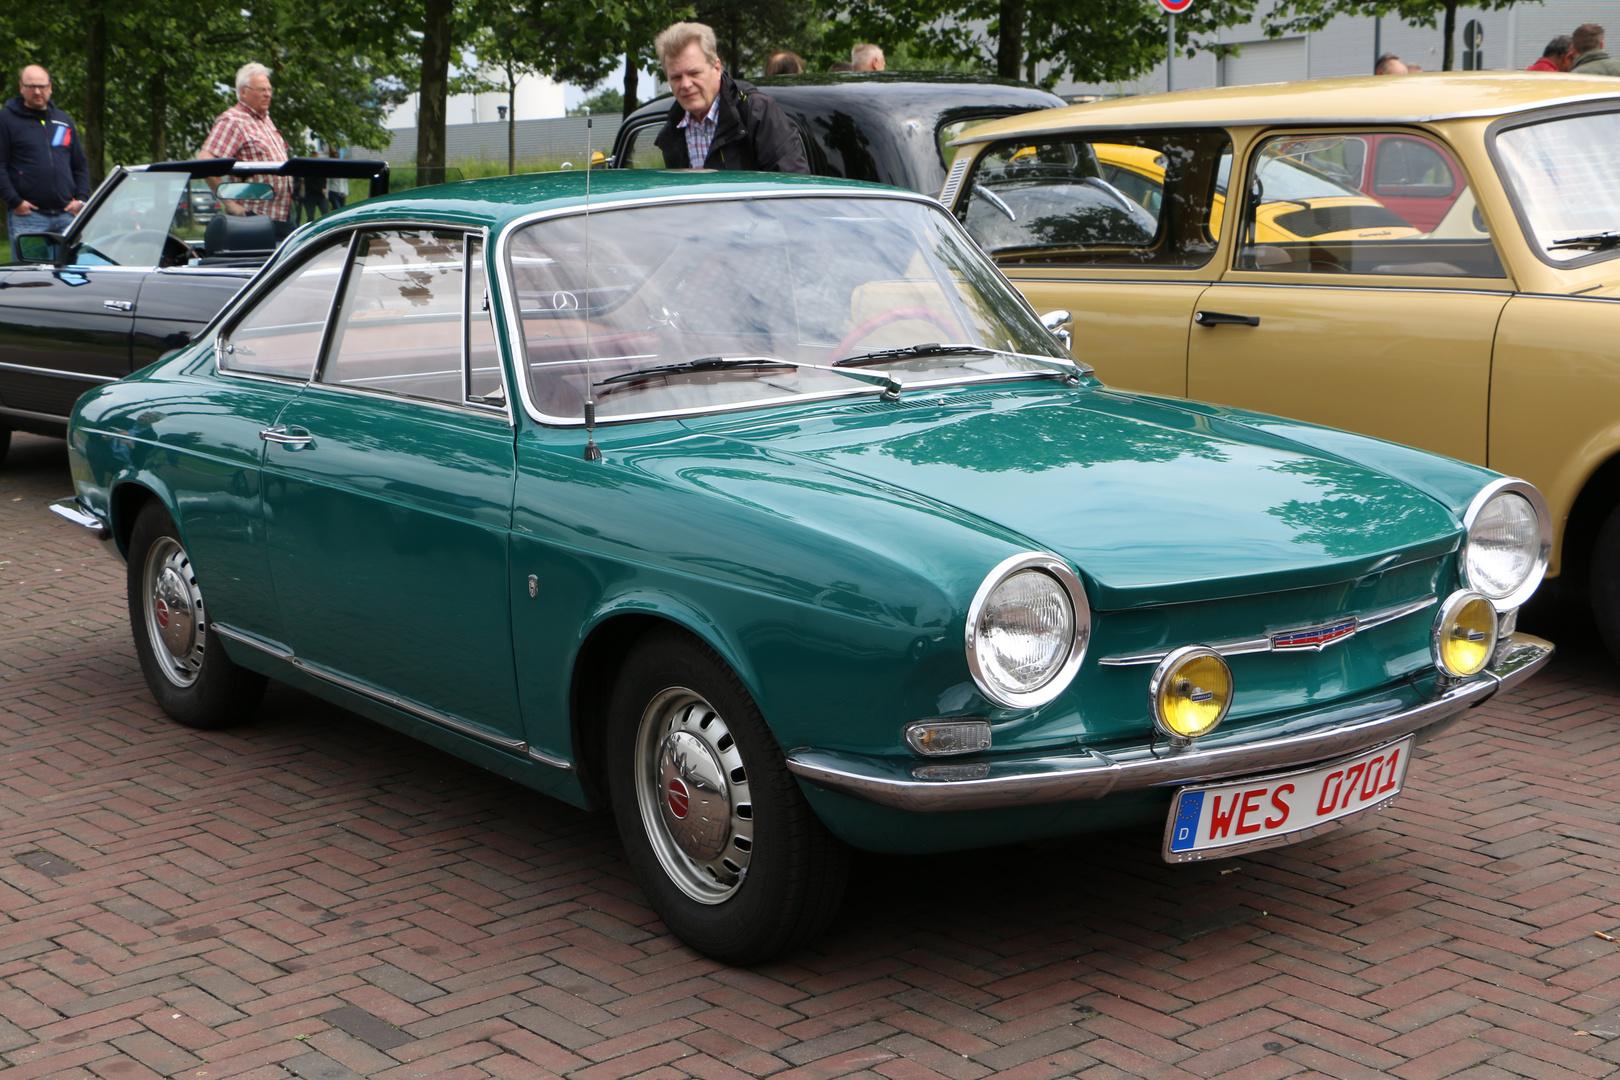 Simca 1000 coupe bertone foto bild oldtimer auto autos bilder auf fotocommunity - Simca 1000 coupe bertone occasion ...